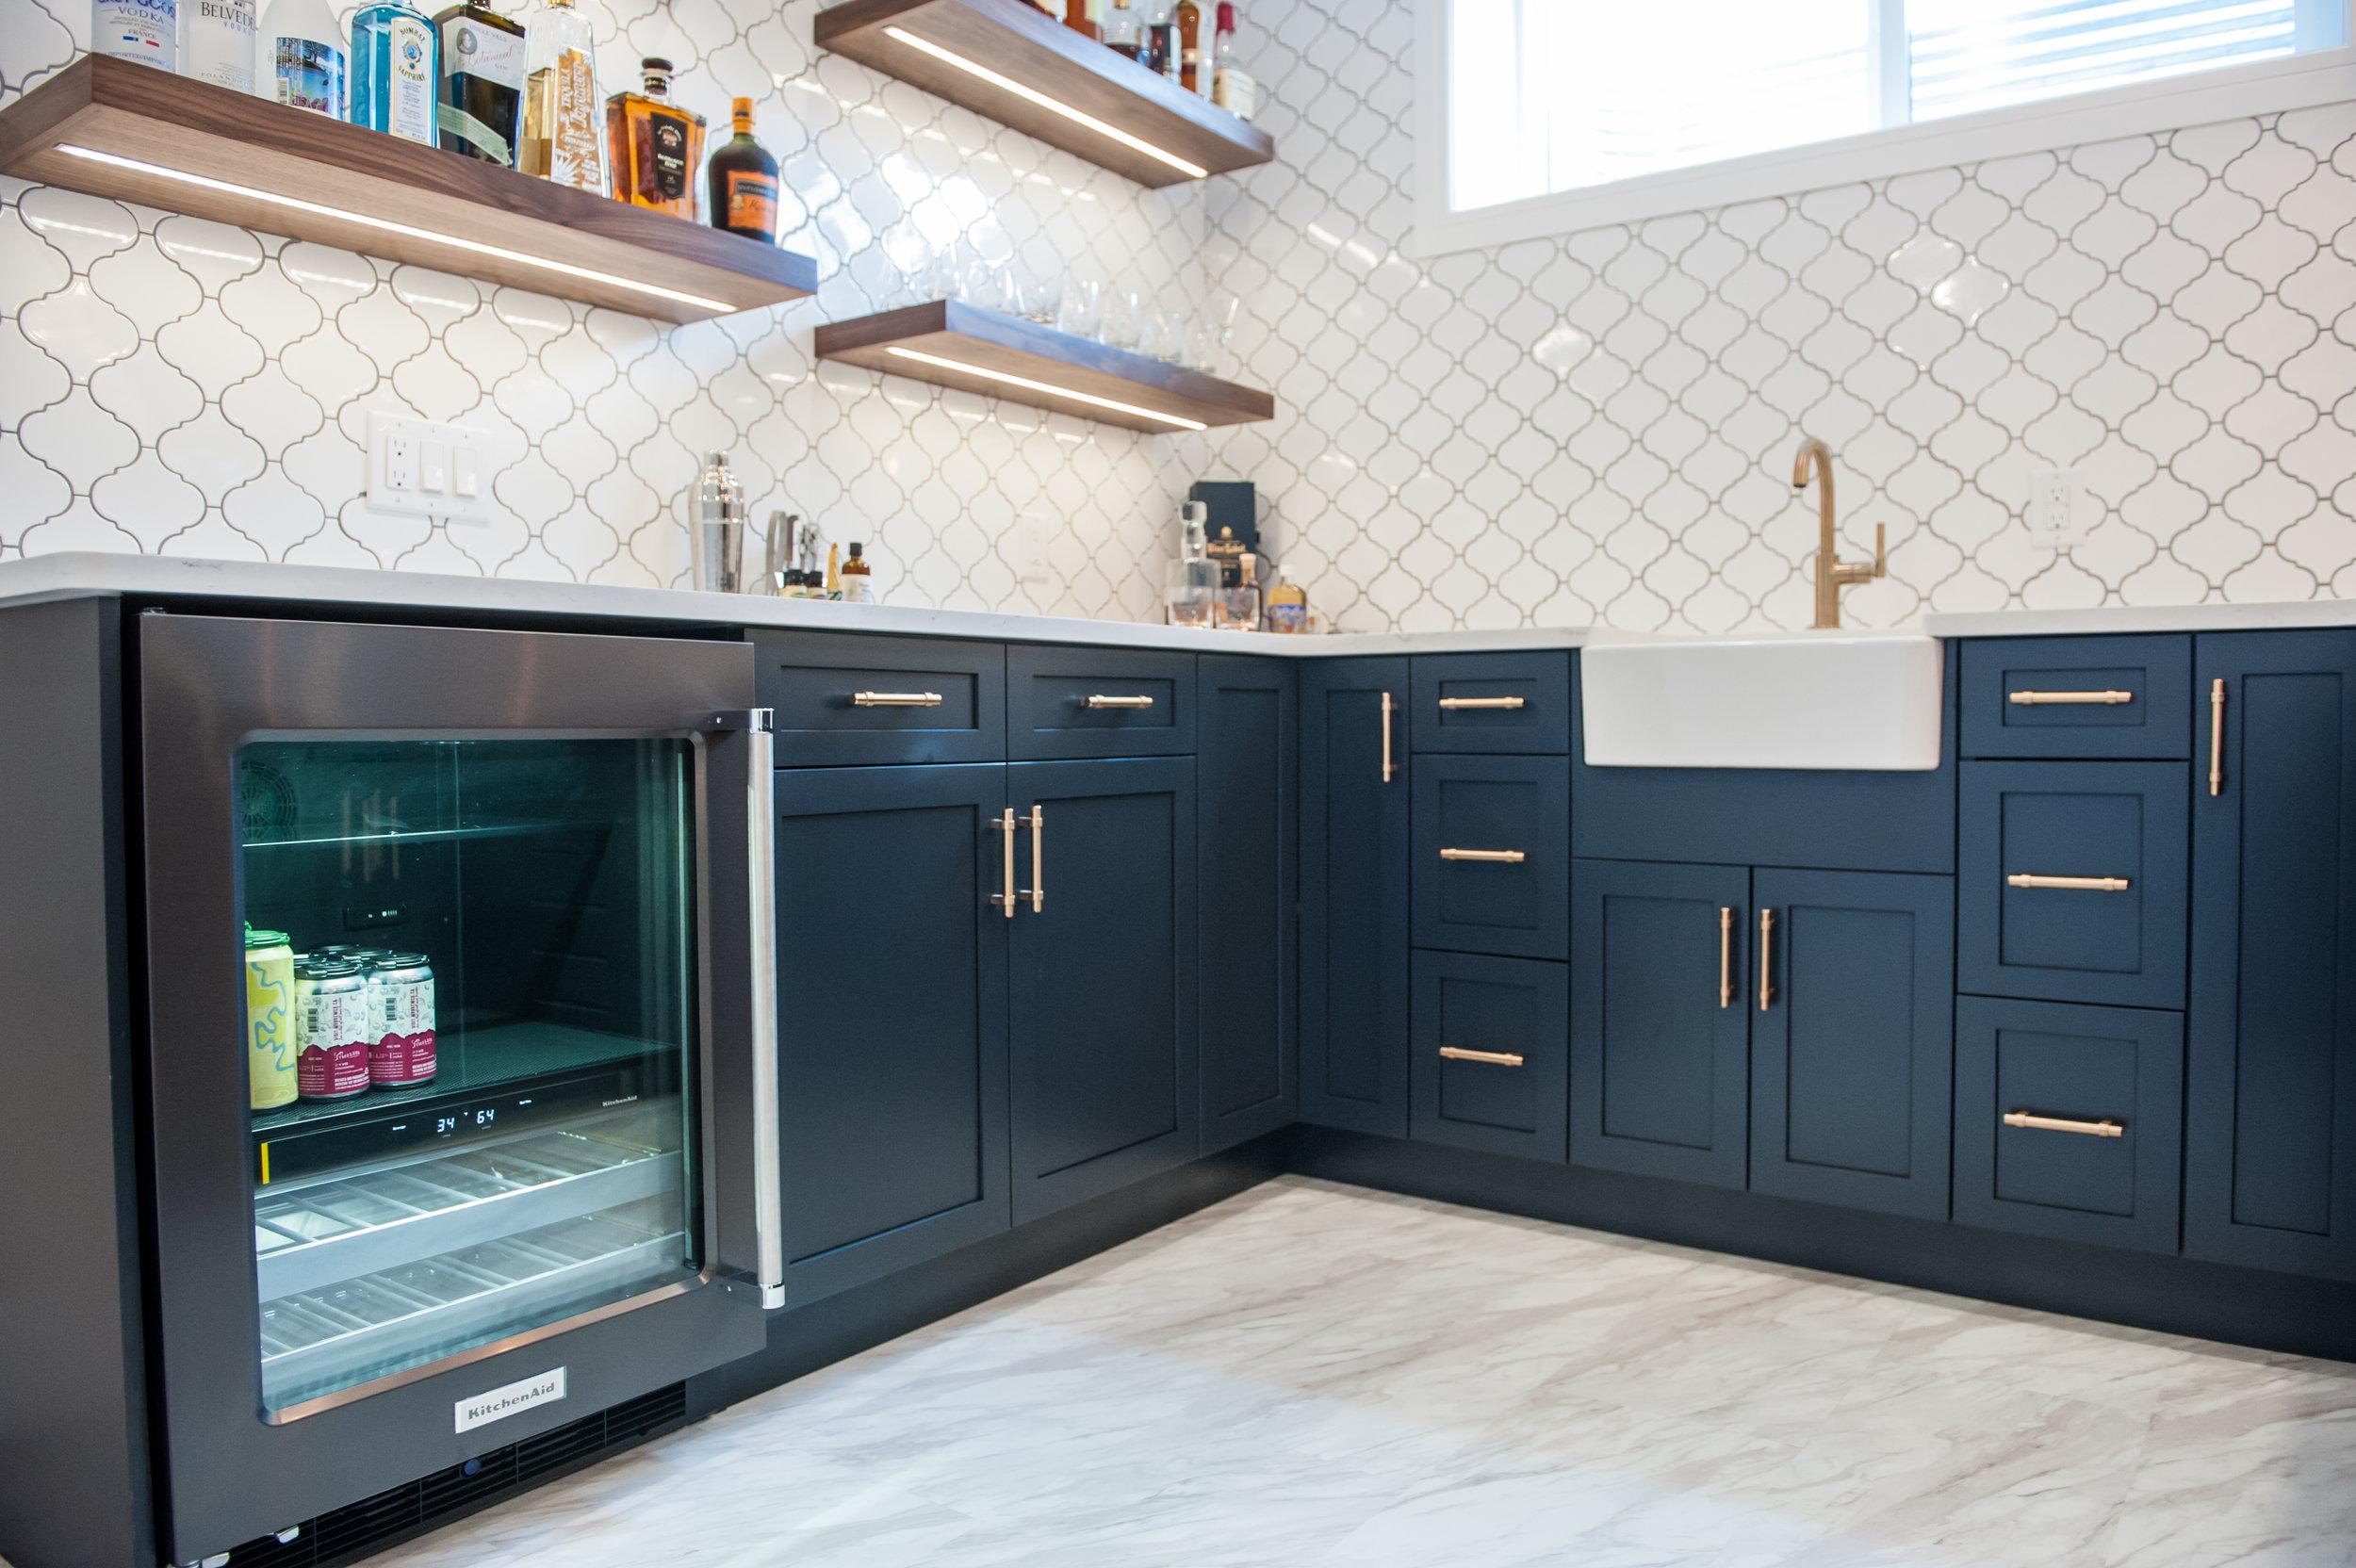 mini_fridge_gold_navy